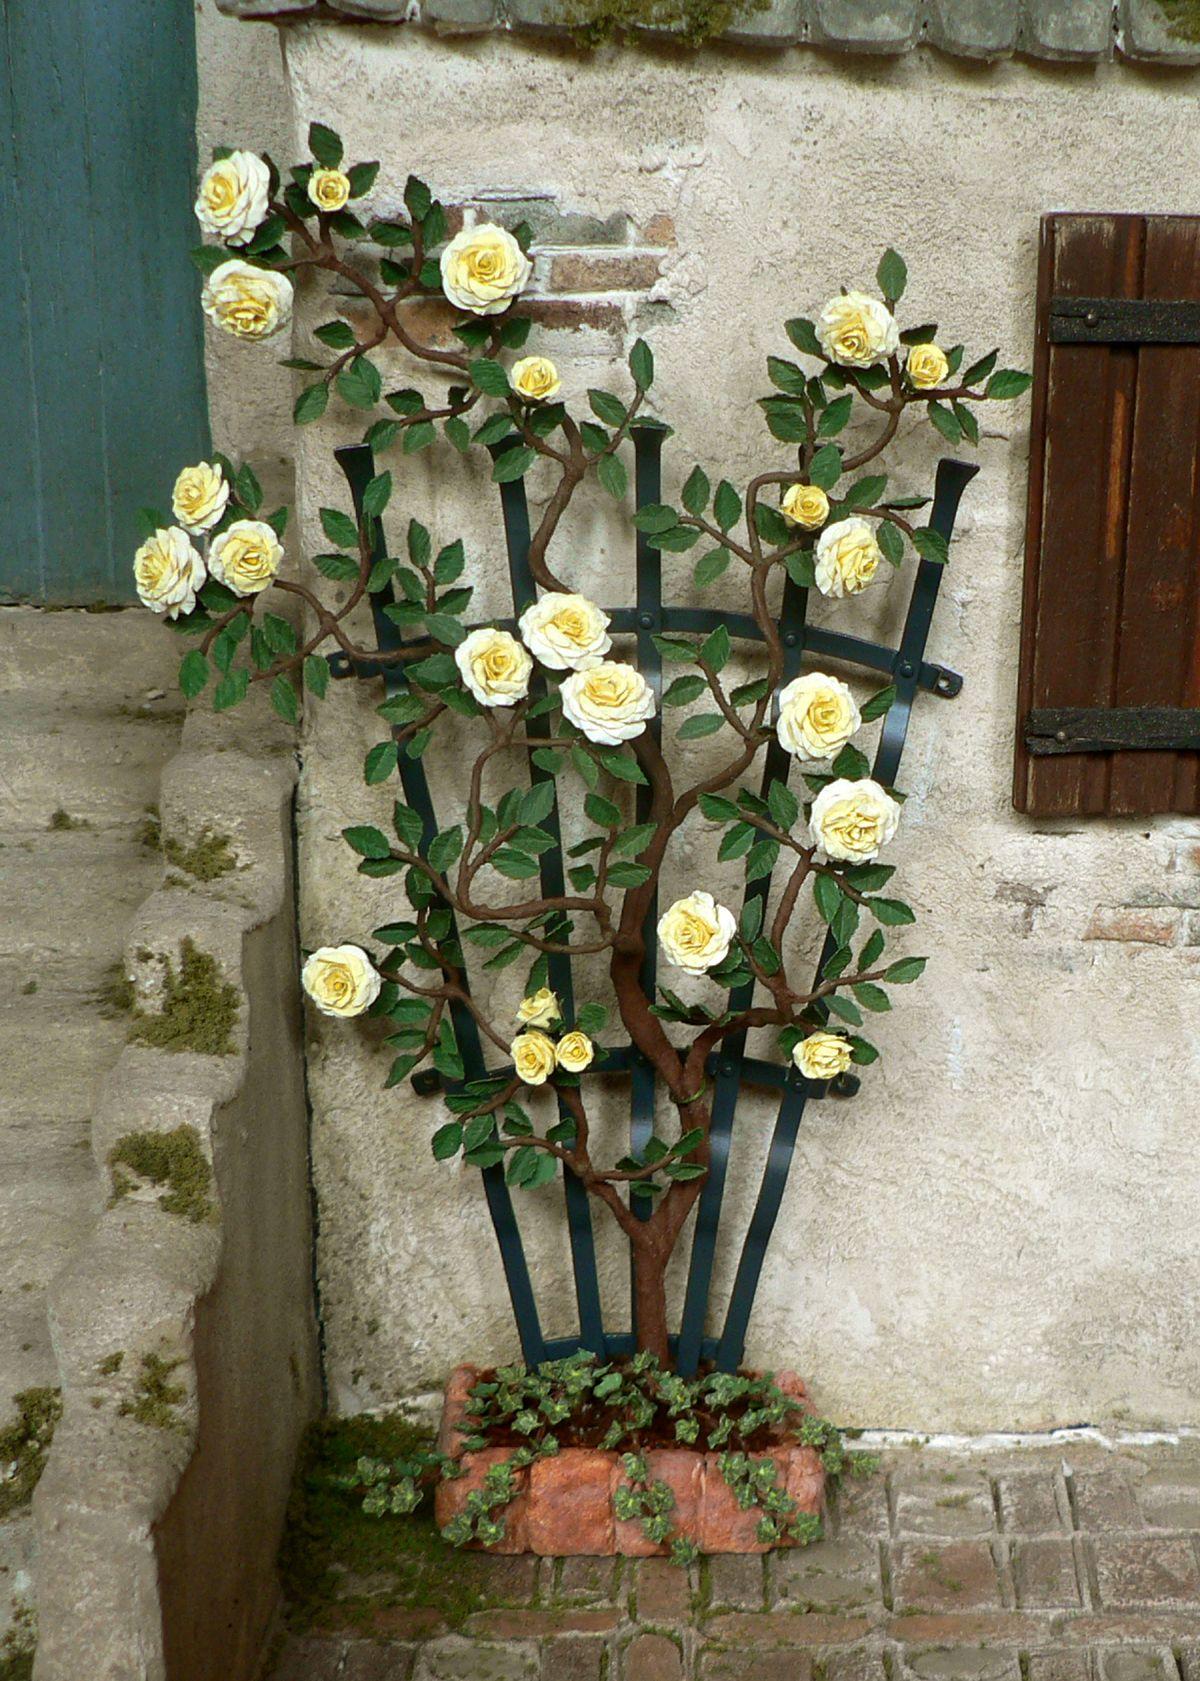 Yellow rose at a fan-shaped trellis